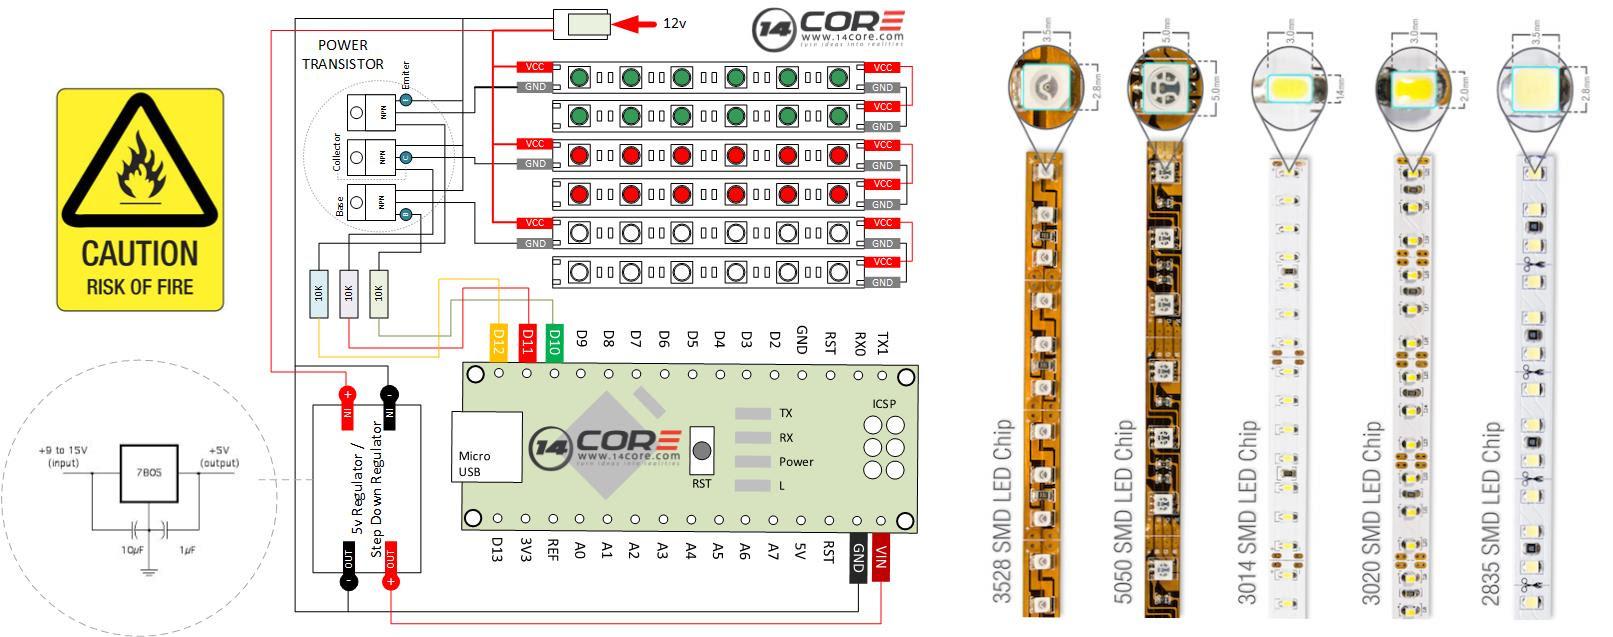 Diagram Led Strips Rgb Wiring Diagram Full Version Hd Quality Wiring Diagram Idioschematic2j Eticaenergetica It